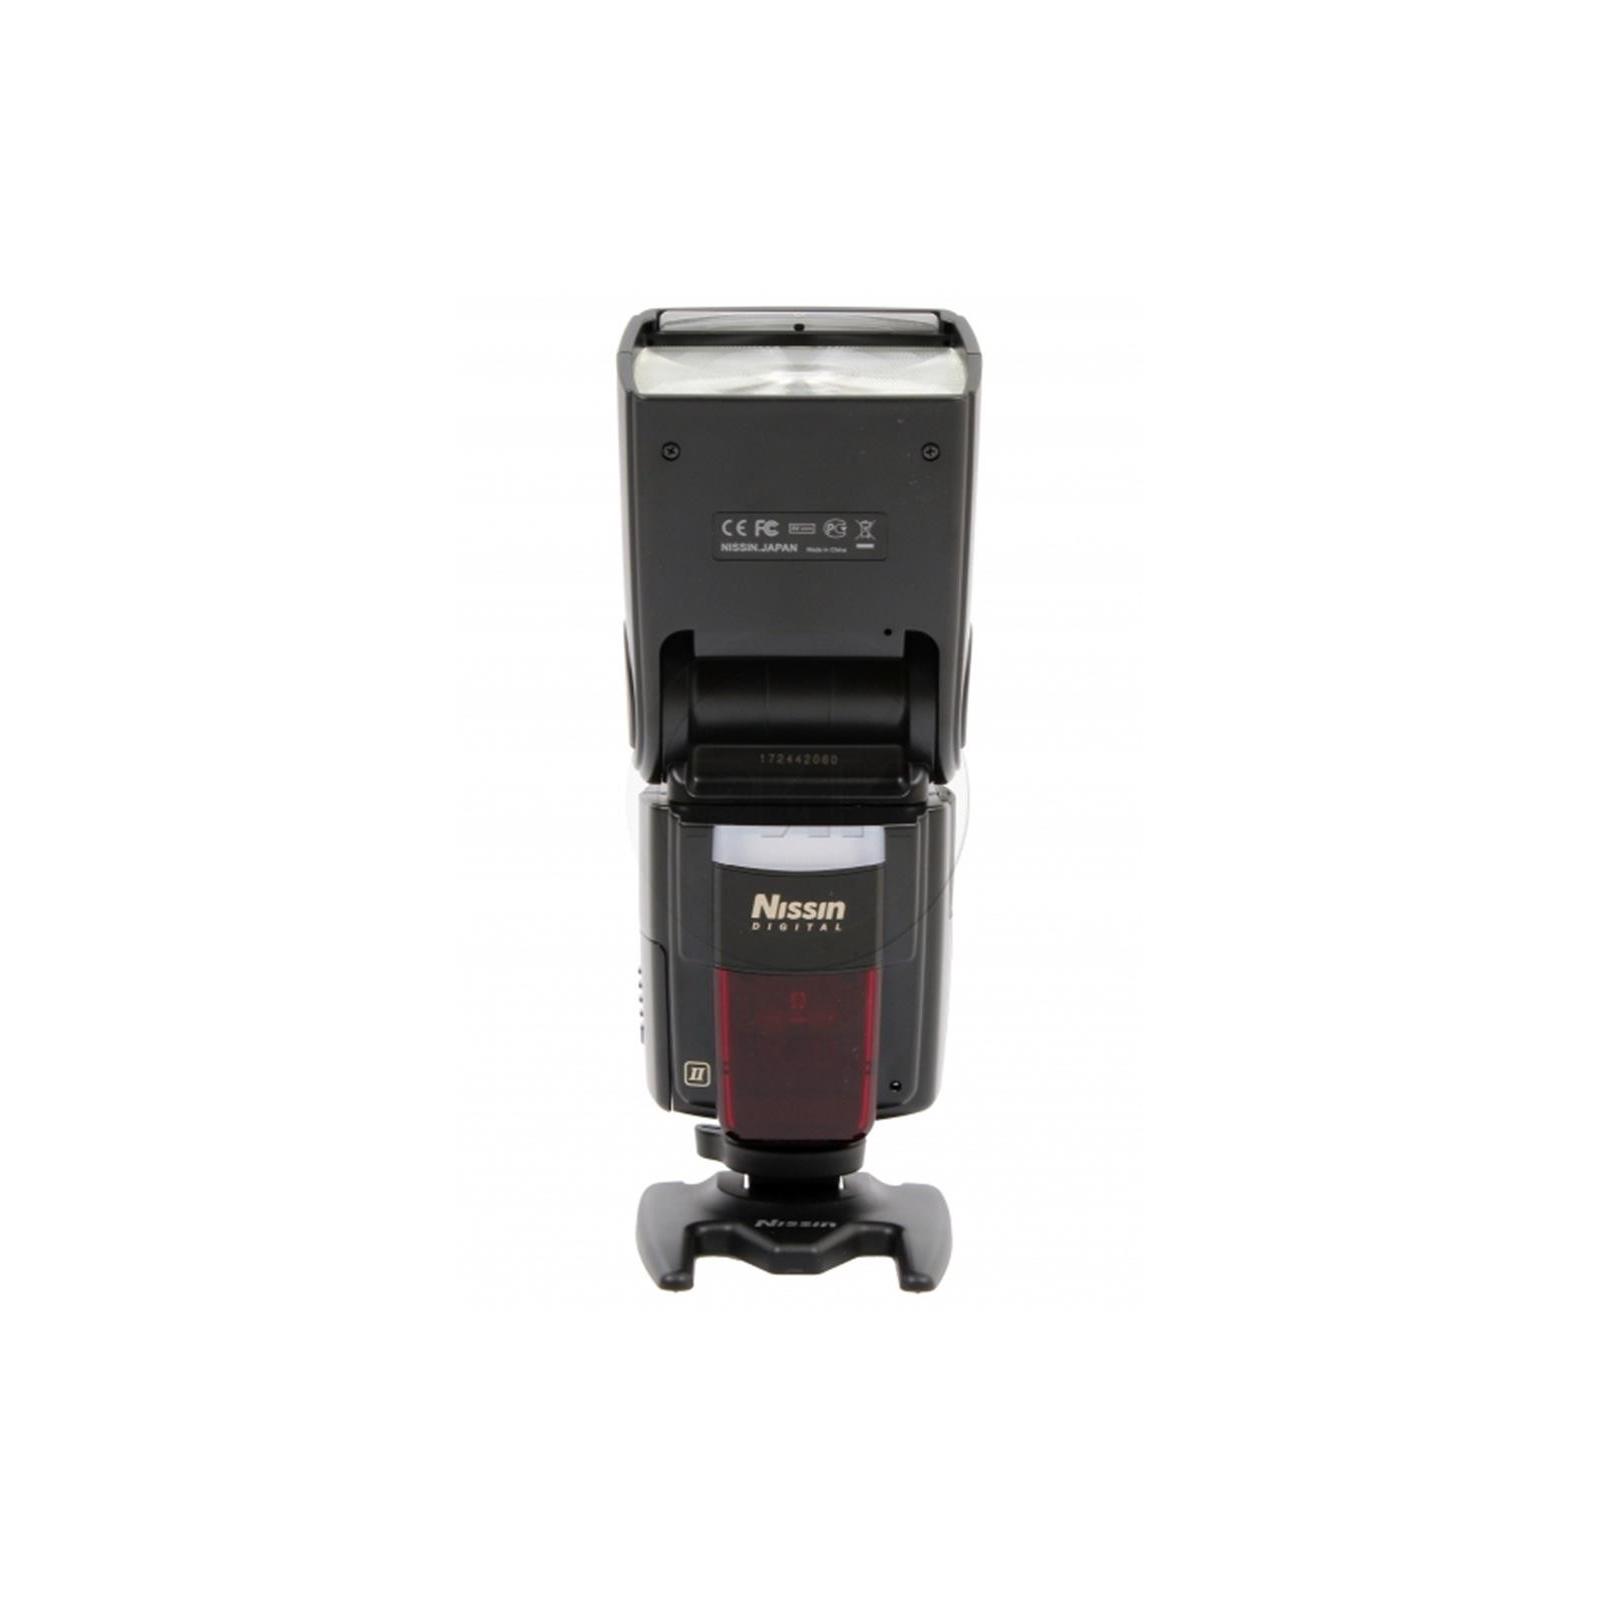 Вспышка Nissin Speedlite Di866 Mark II Canon + Powerex 2700 (NI-DI822IIC) изображение 3